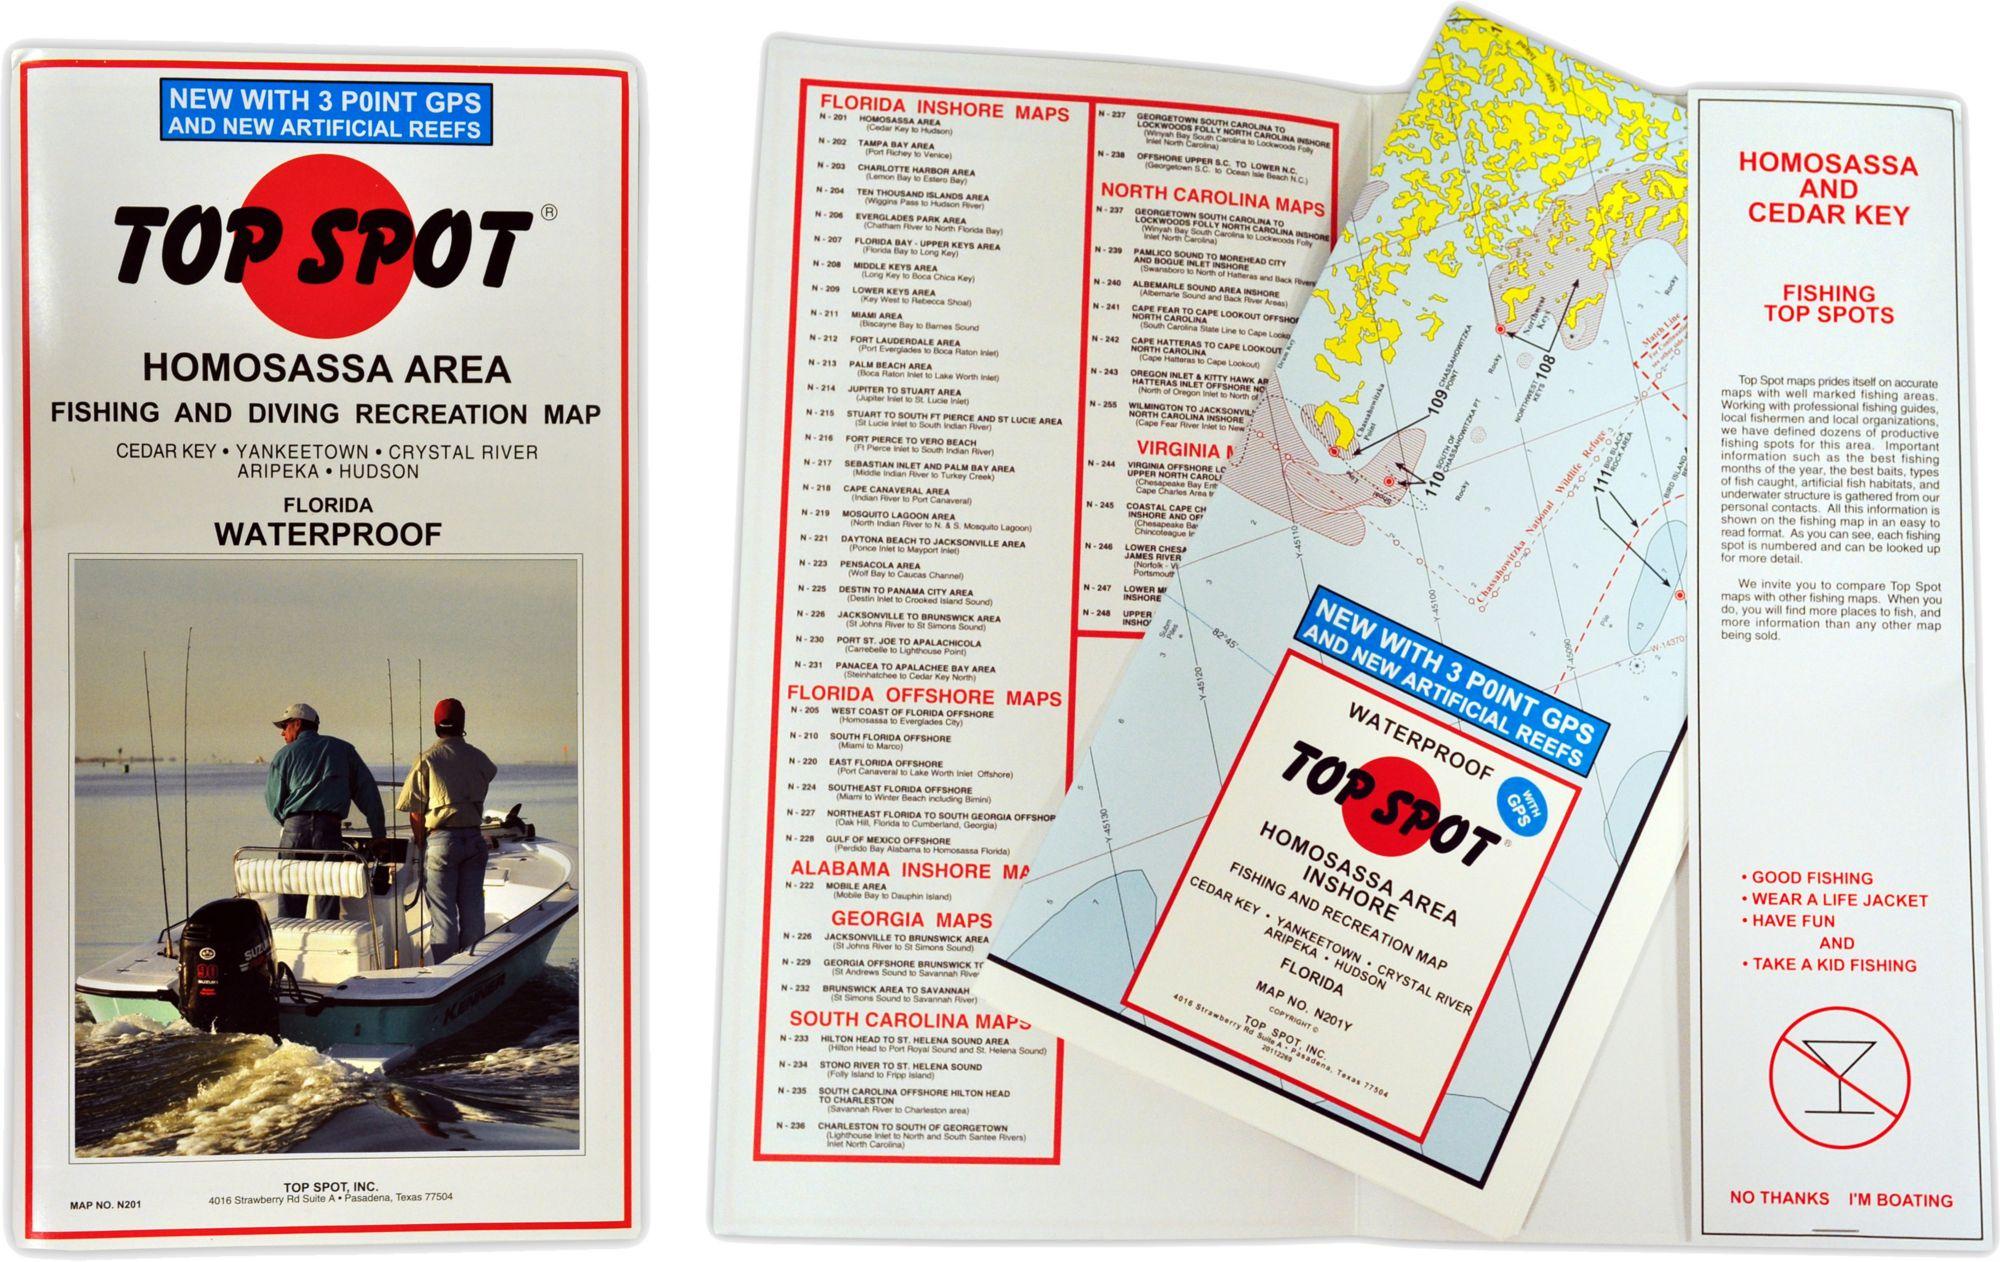 Top Spot Florida Homosassa Area Fishing Map DICKS Sporting Goods - Florida map crystal river